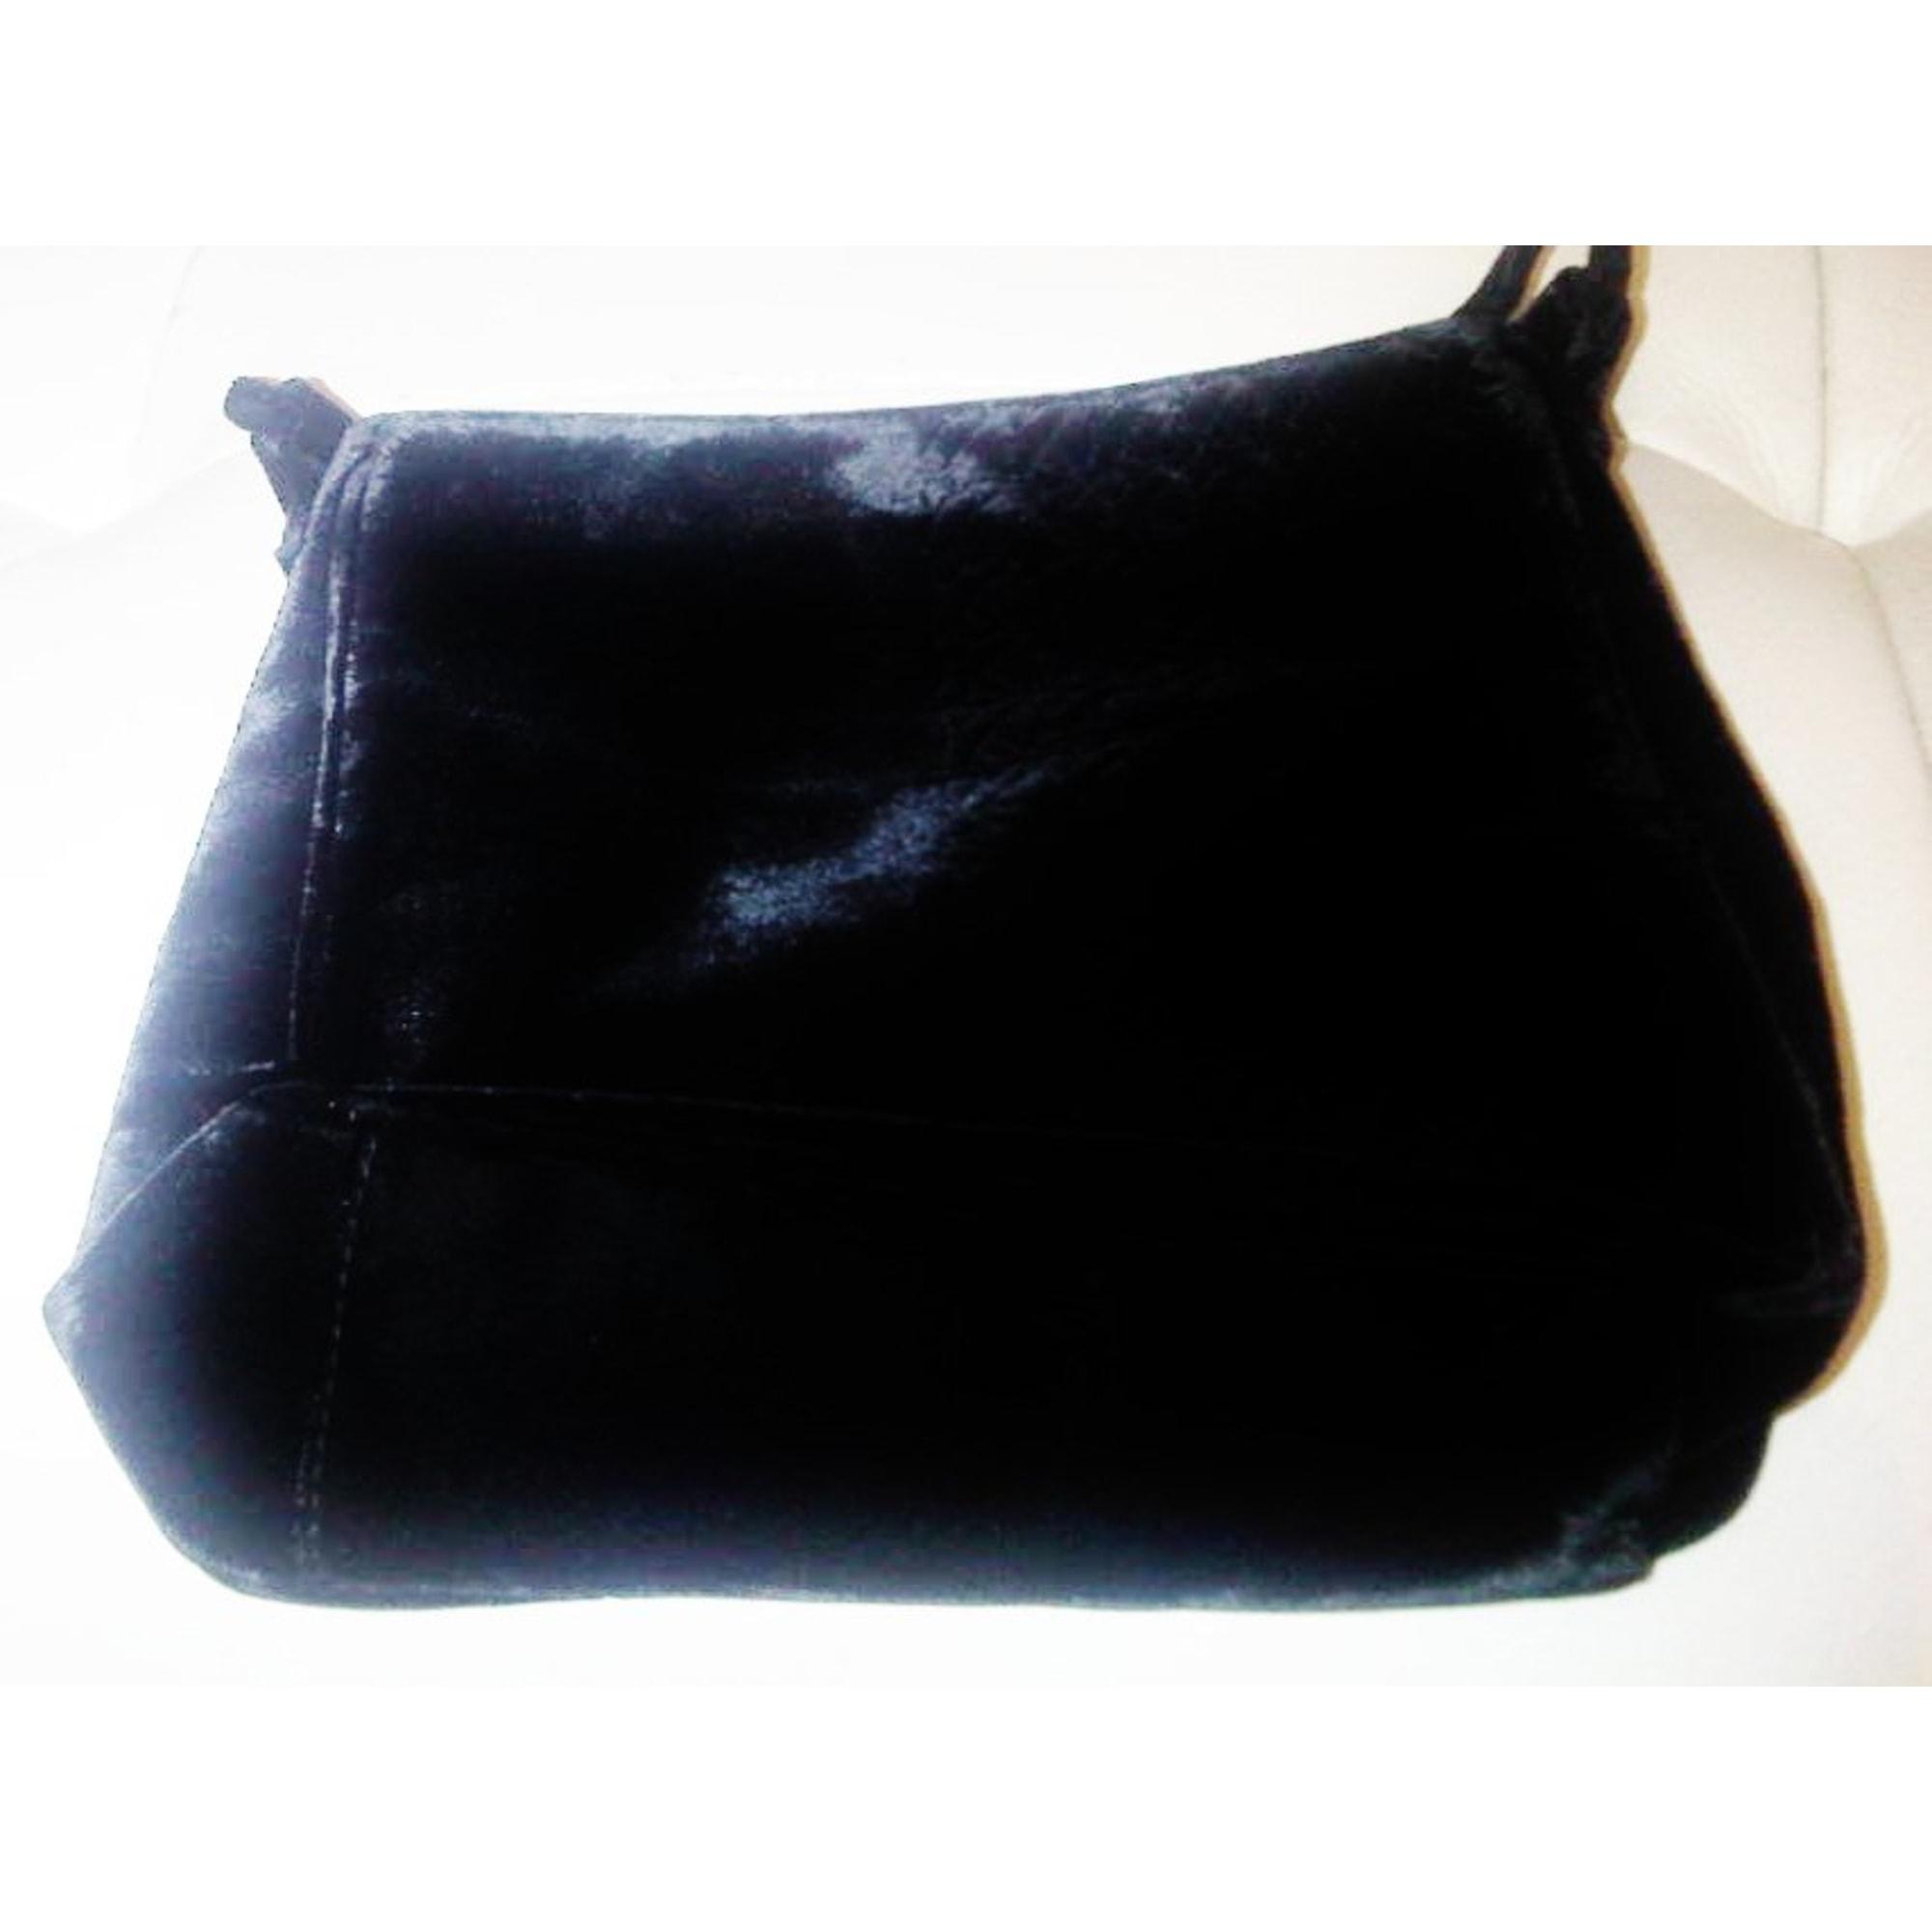 Sac pochette en tissu PALOMA PICASSO velours noir